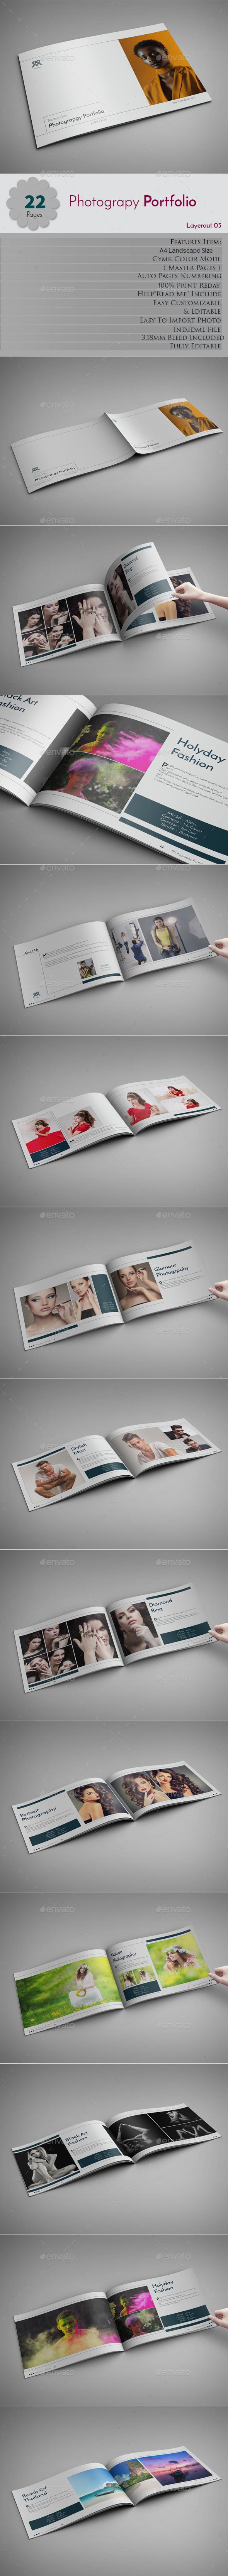 Photography Portfolio Layerout 03 - Photo Albums Print Templates